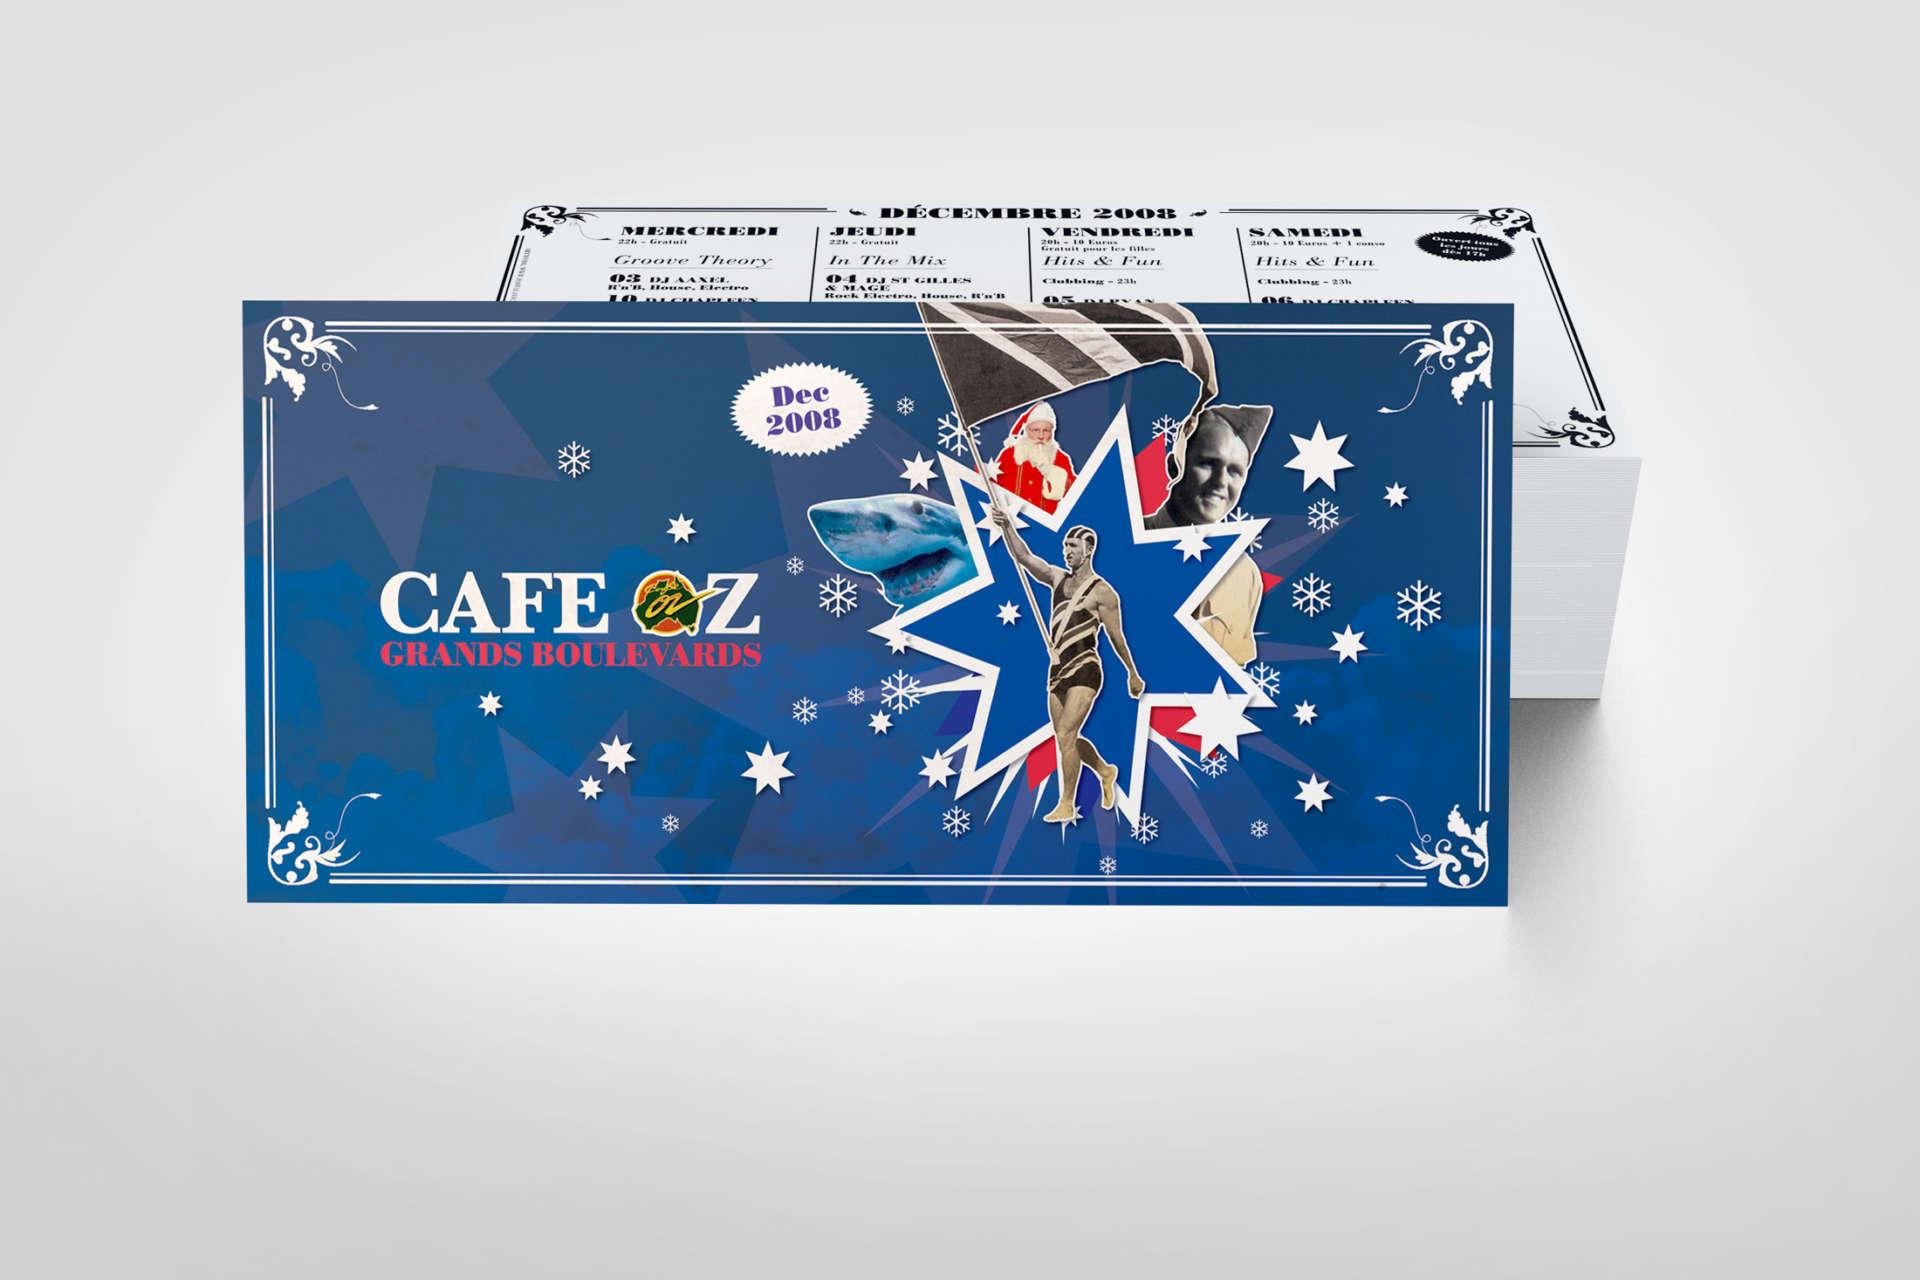 CafeOz-GdBd-02